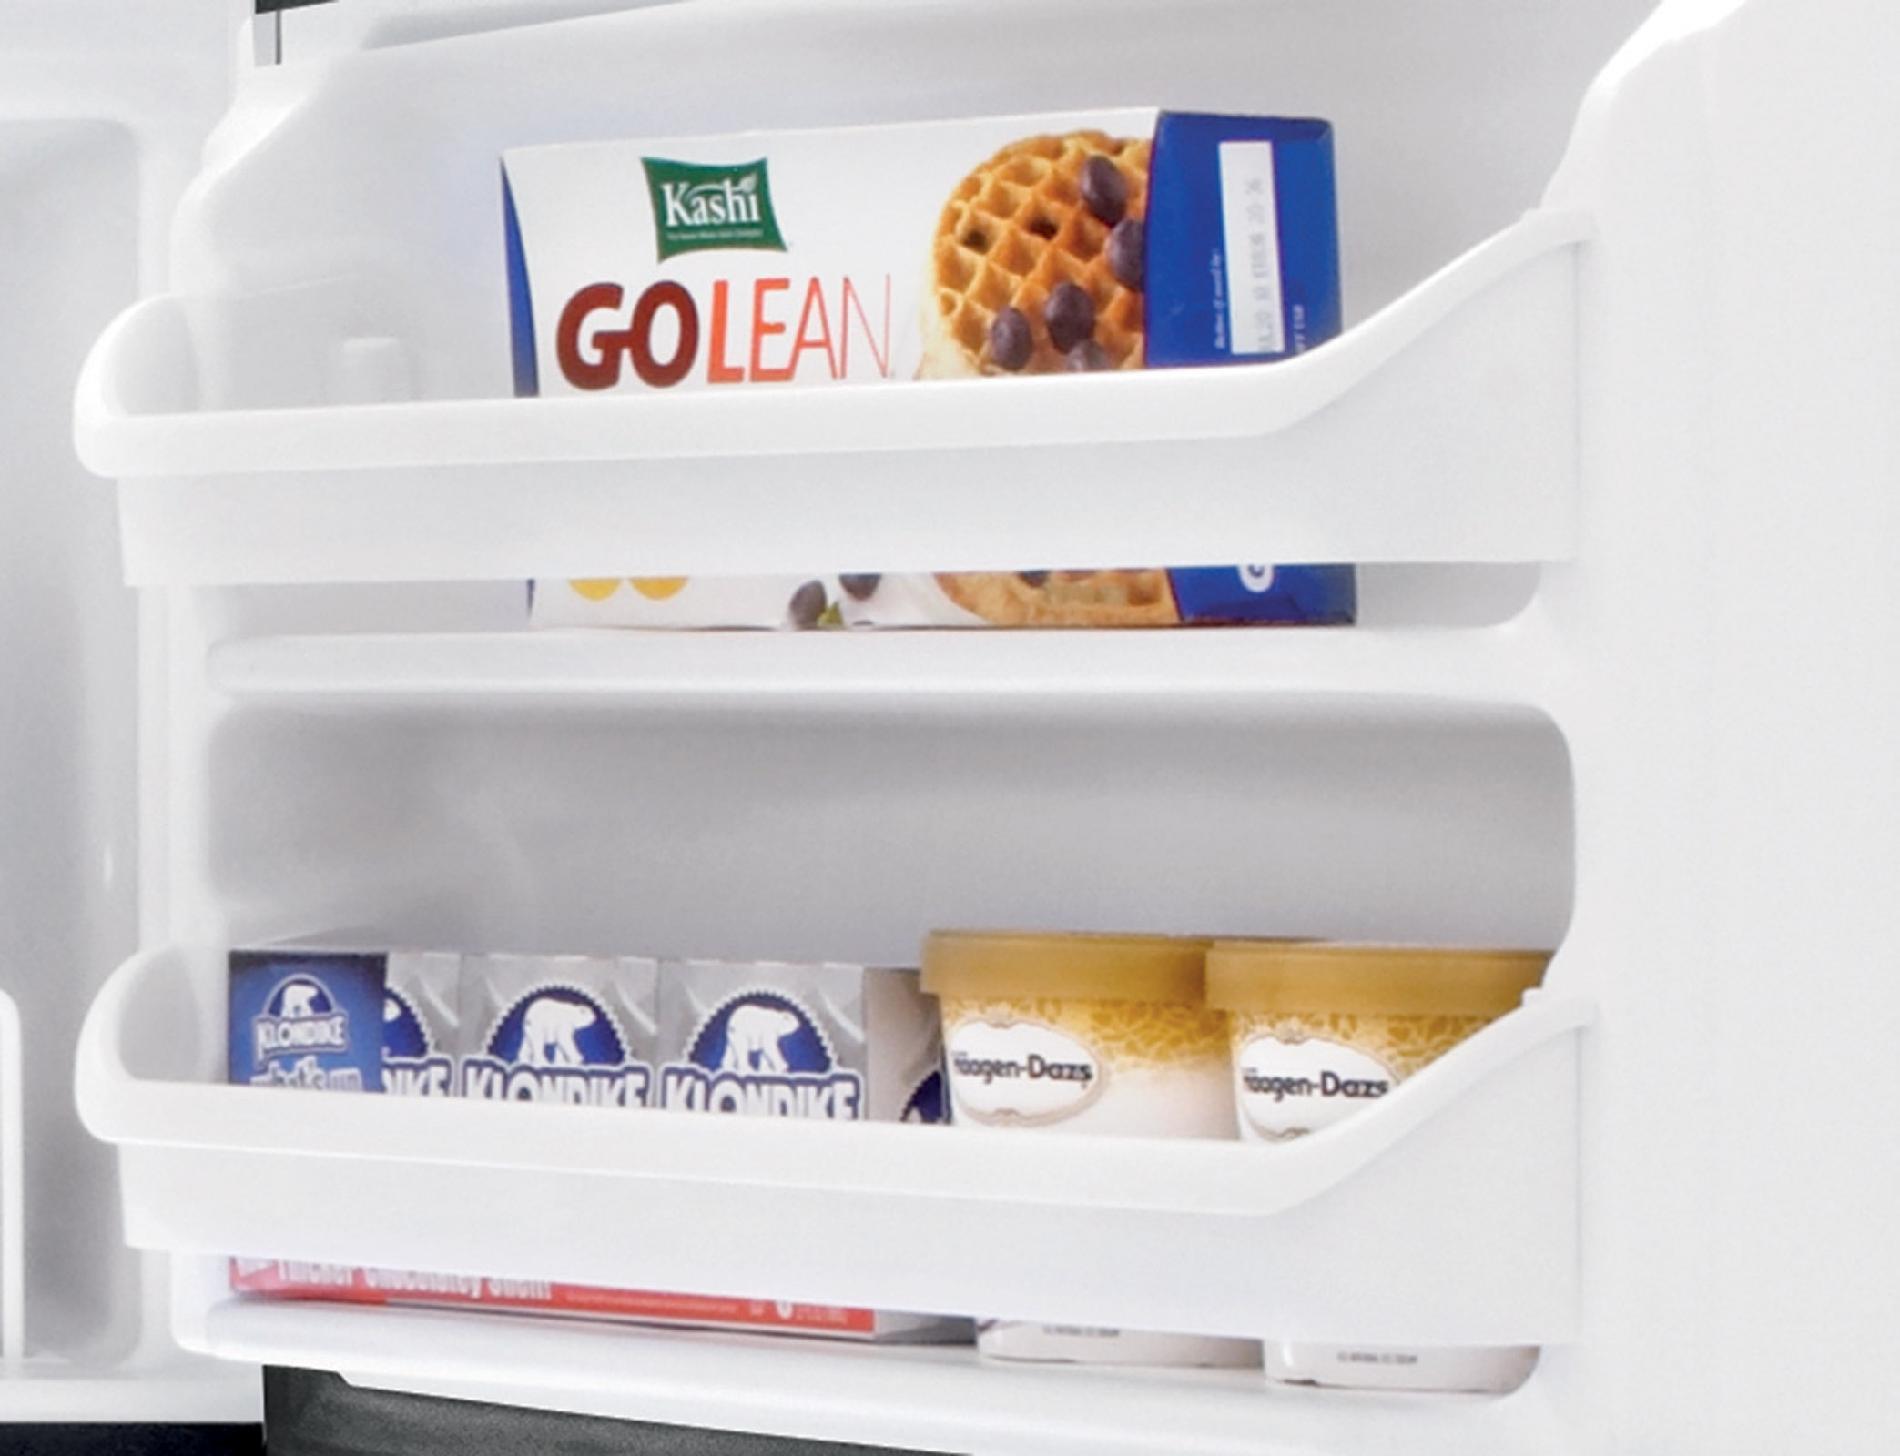 Frigidaire 14.8 cu. ft. Top-Freezer Refrigerator - Stainless Steel